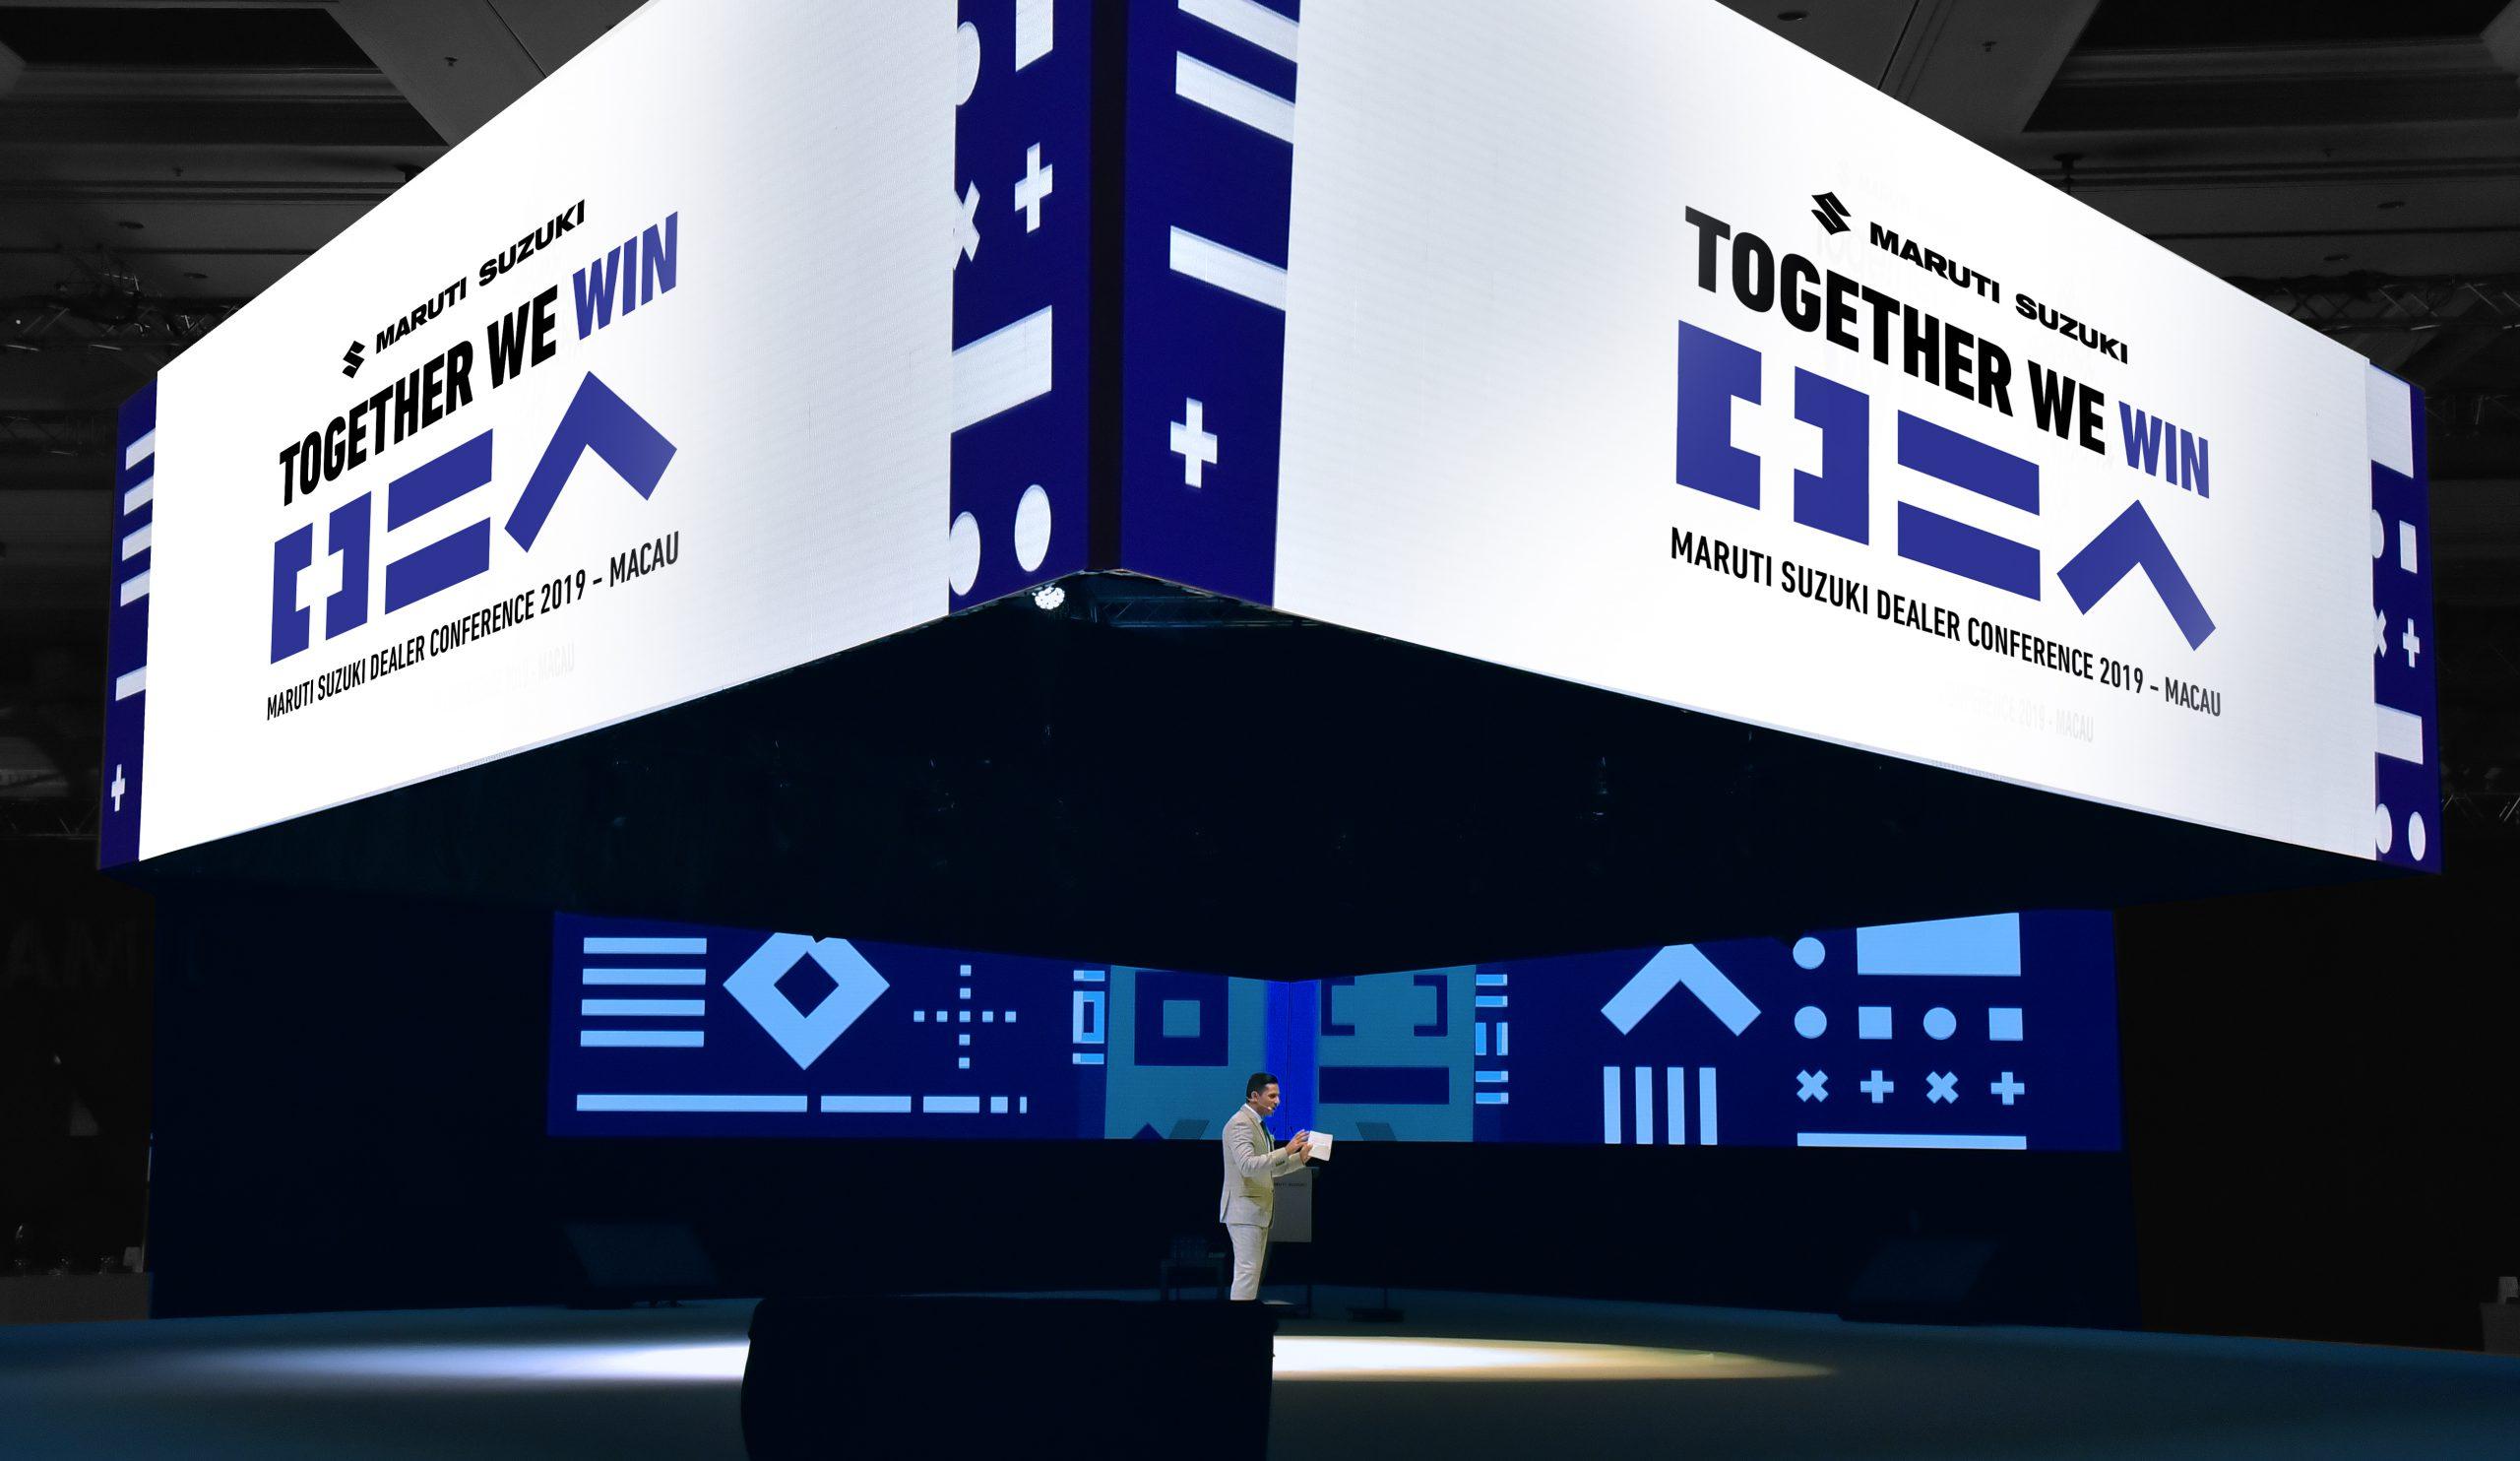 MSDC_Arena_Presentation_02